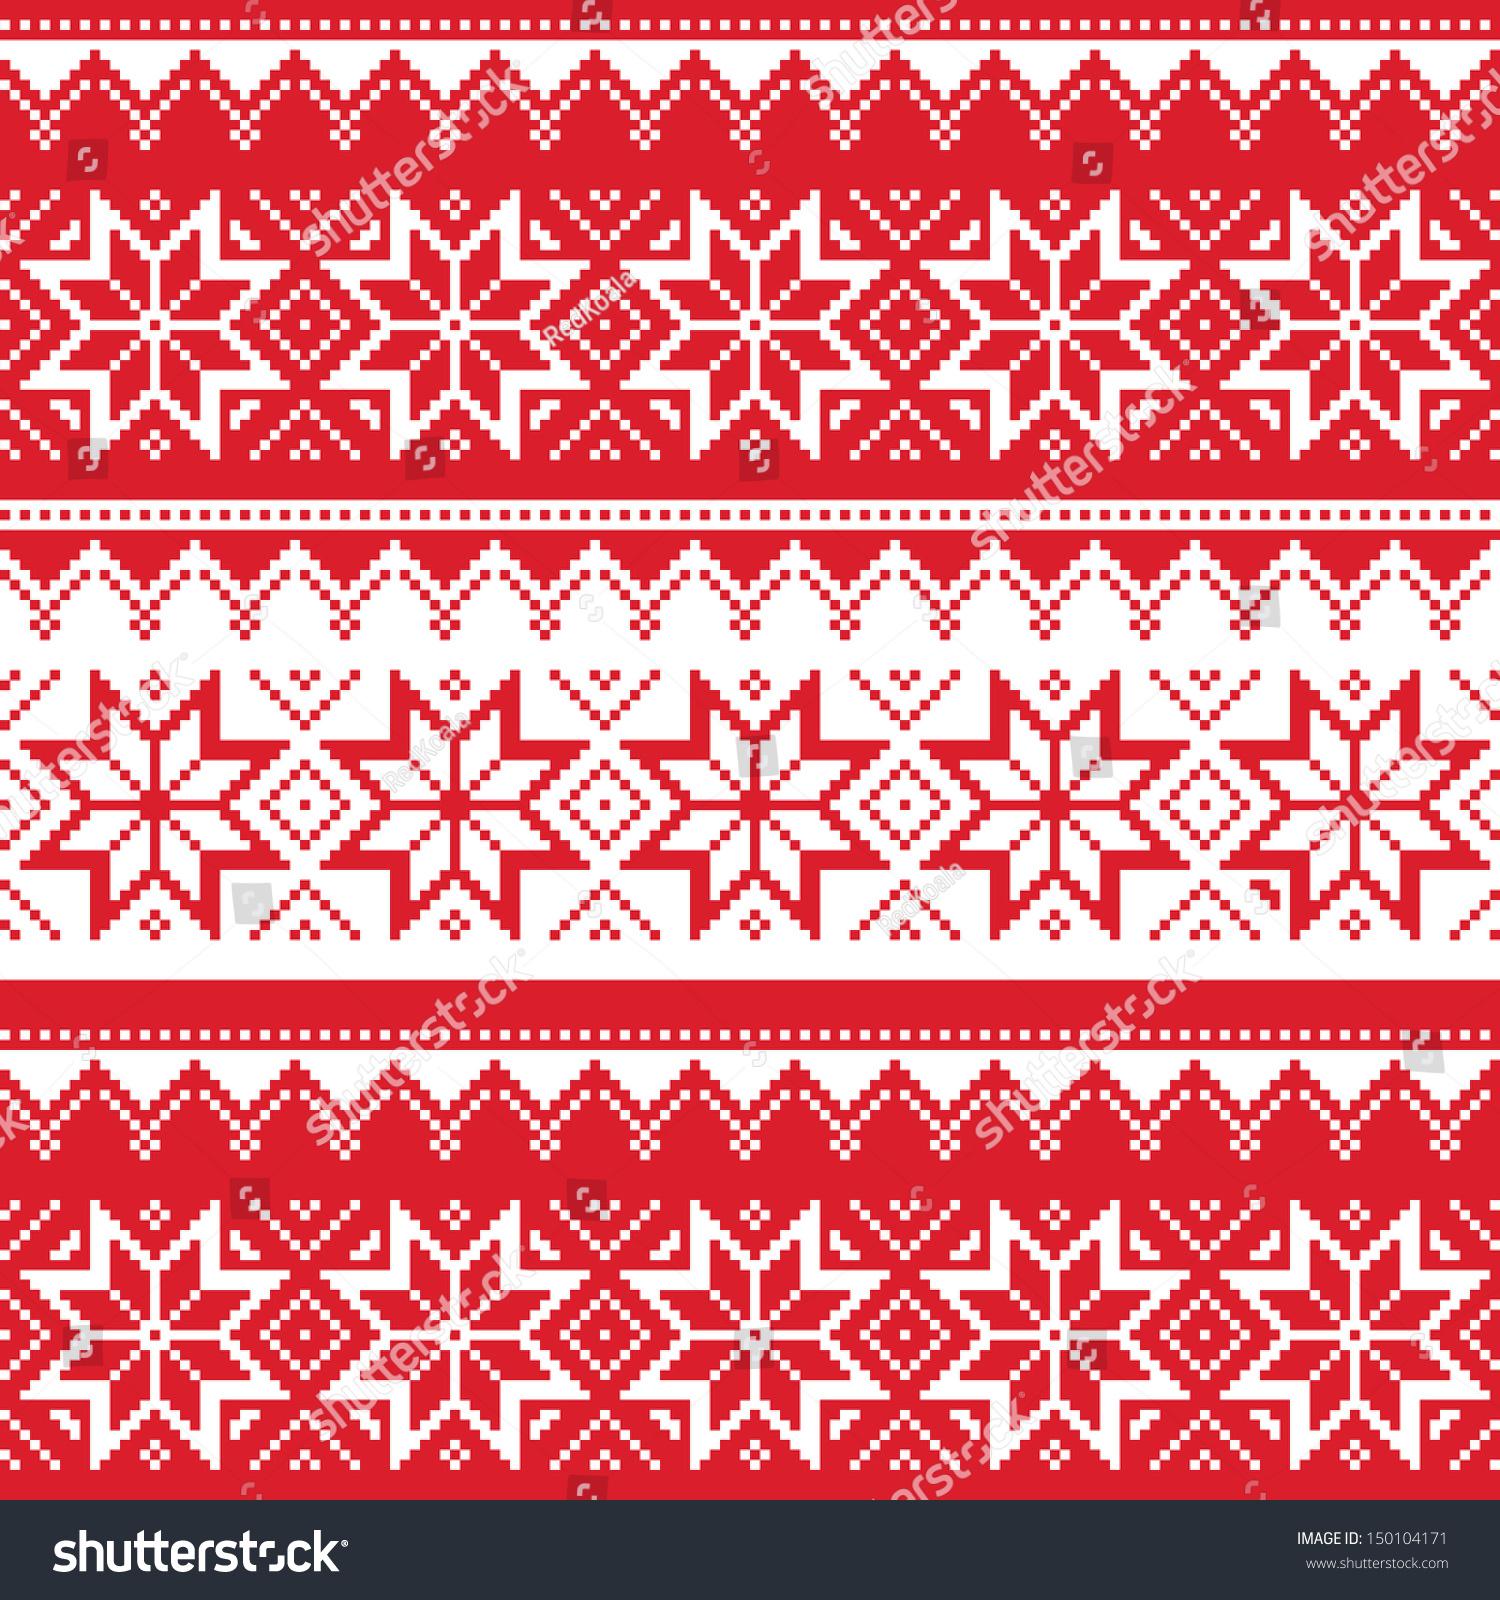 Cute Tribal Print Wallpaper Nordic Seamless Christmas Red Pattern Stock Vector